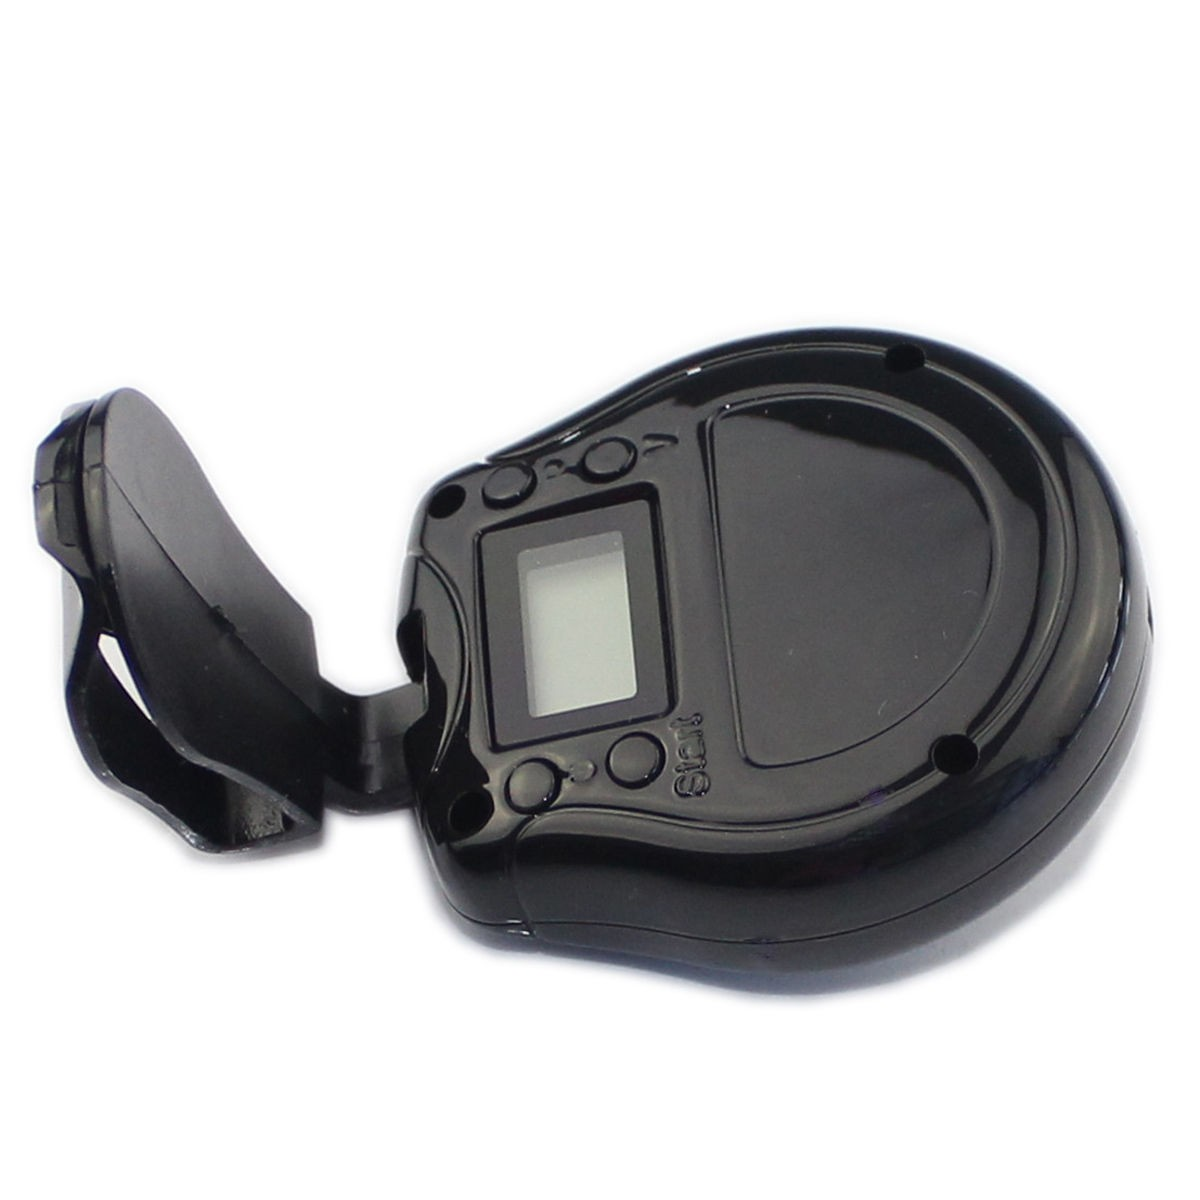 Camera to Monitor Animals